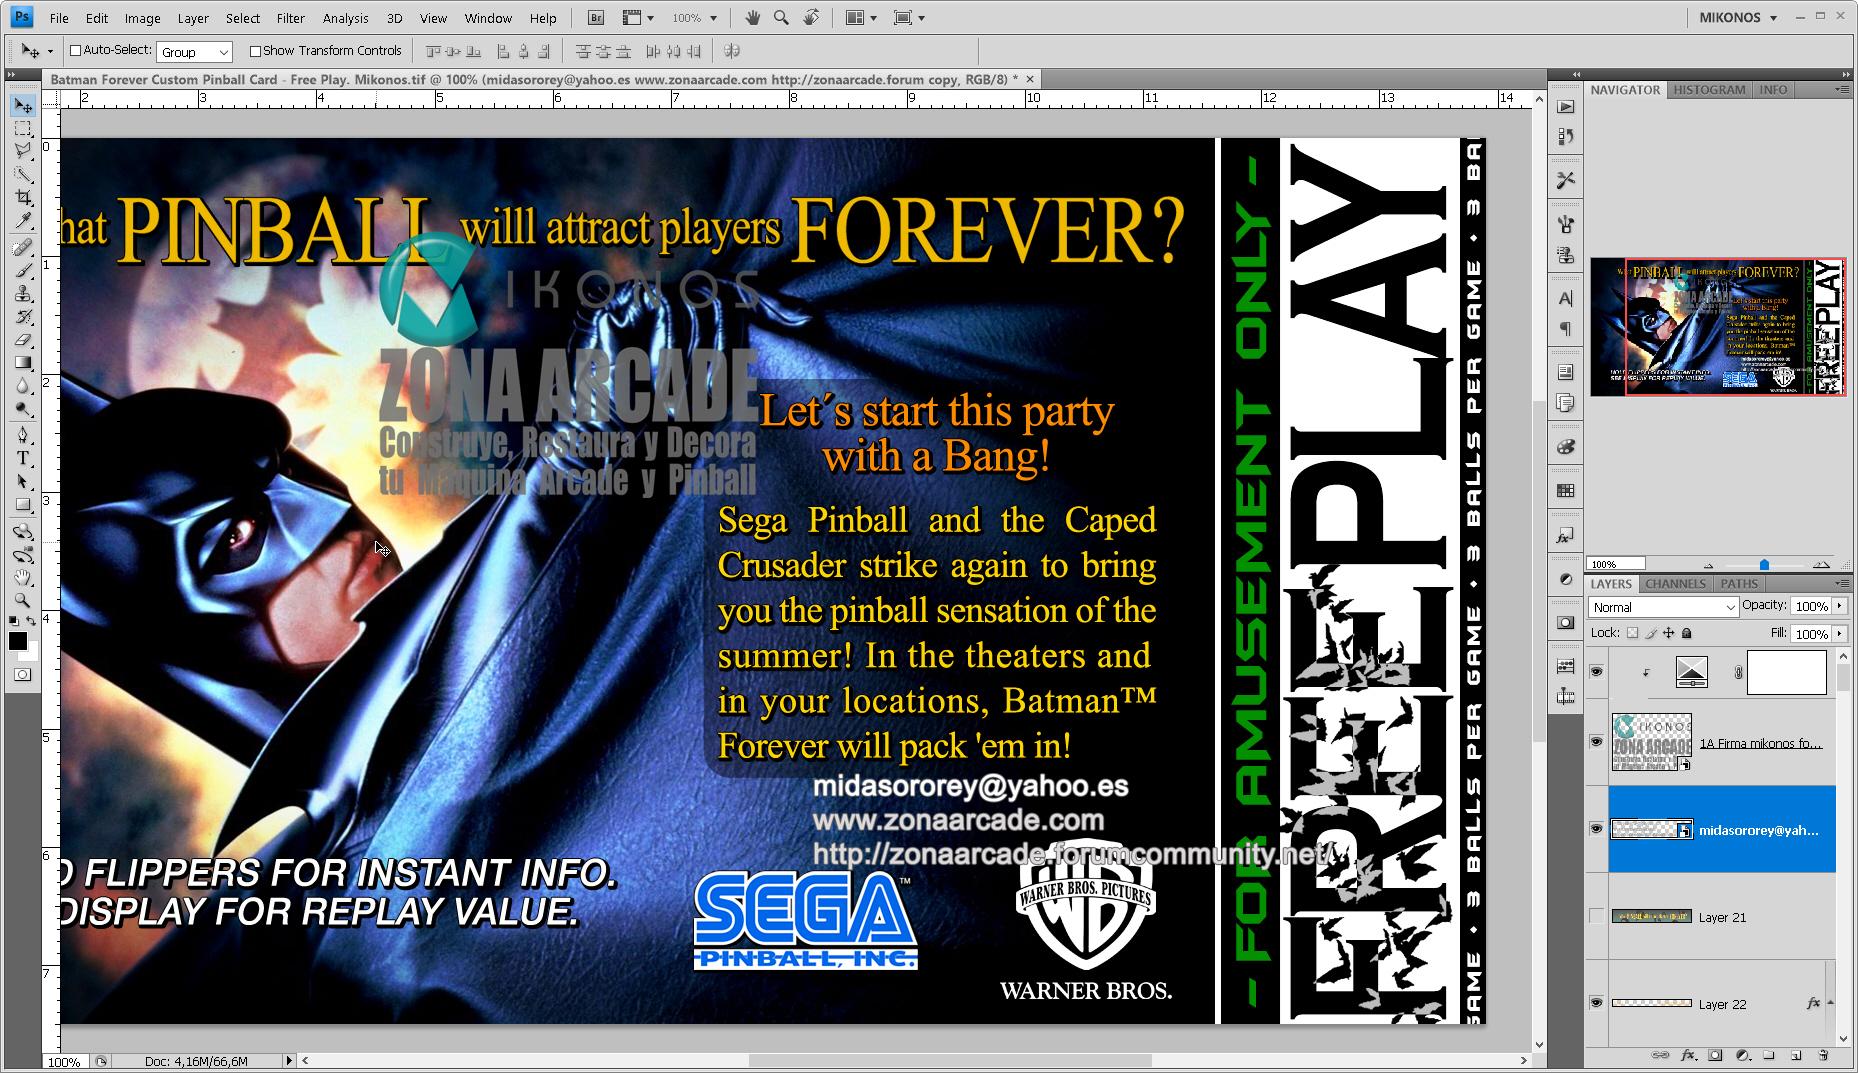 Batman%20Forever%20Custom%20Pinball%20Card%20-%20Free%20Play.%20Mikonos2.jpg